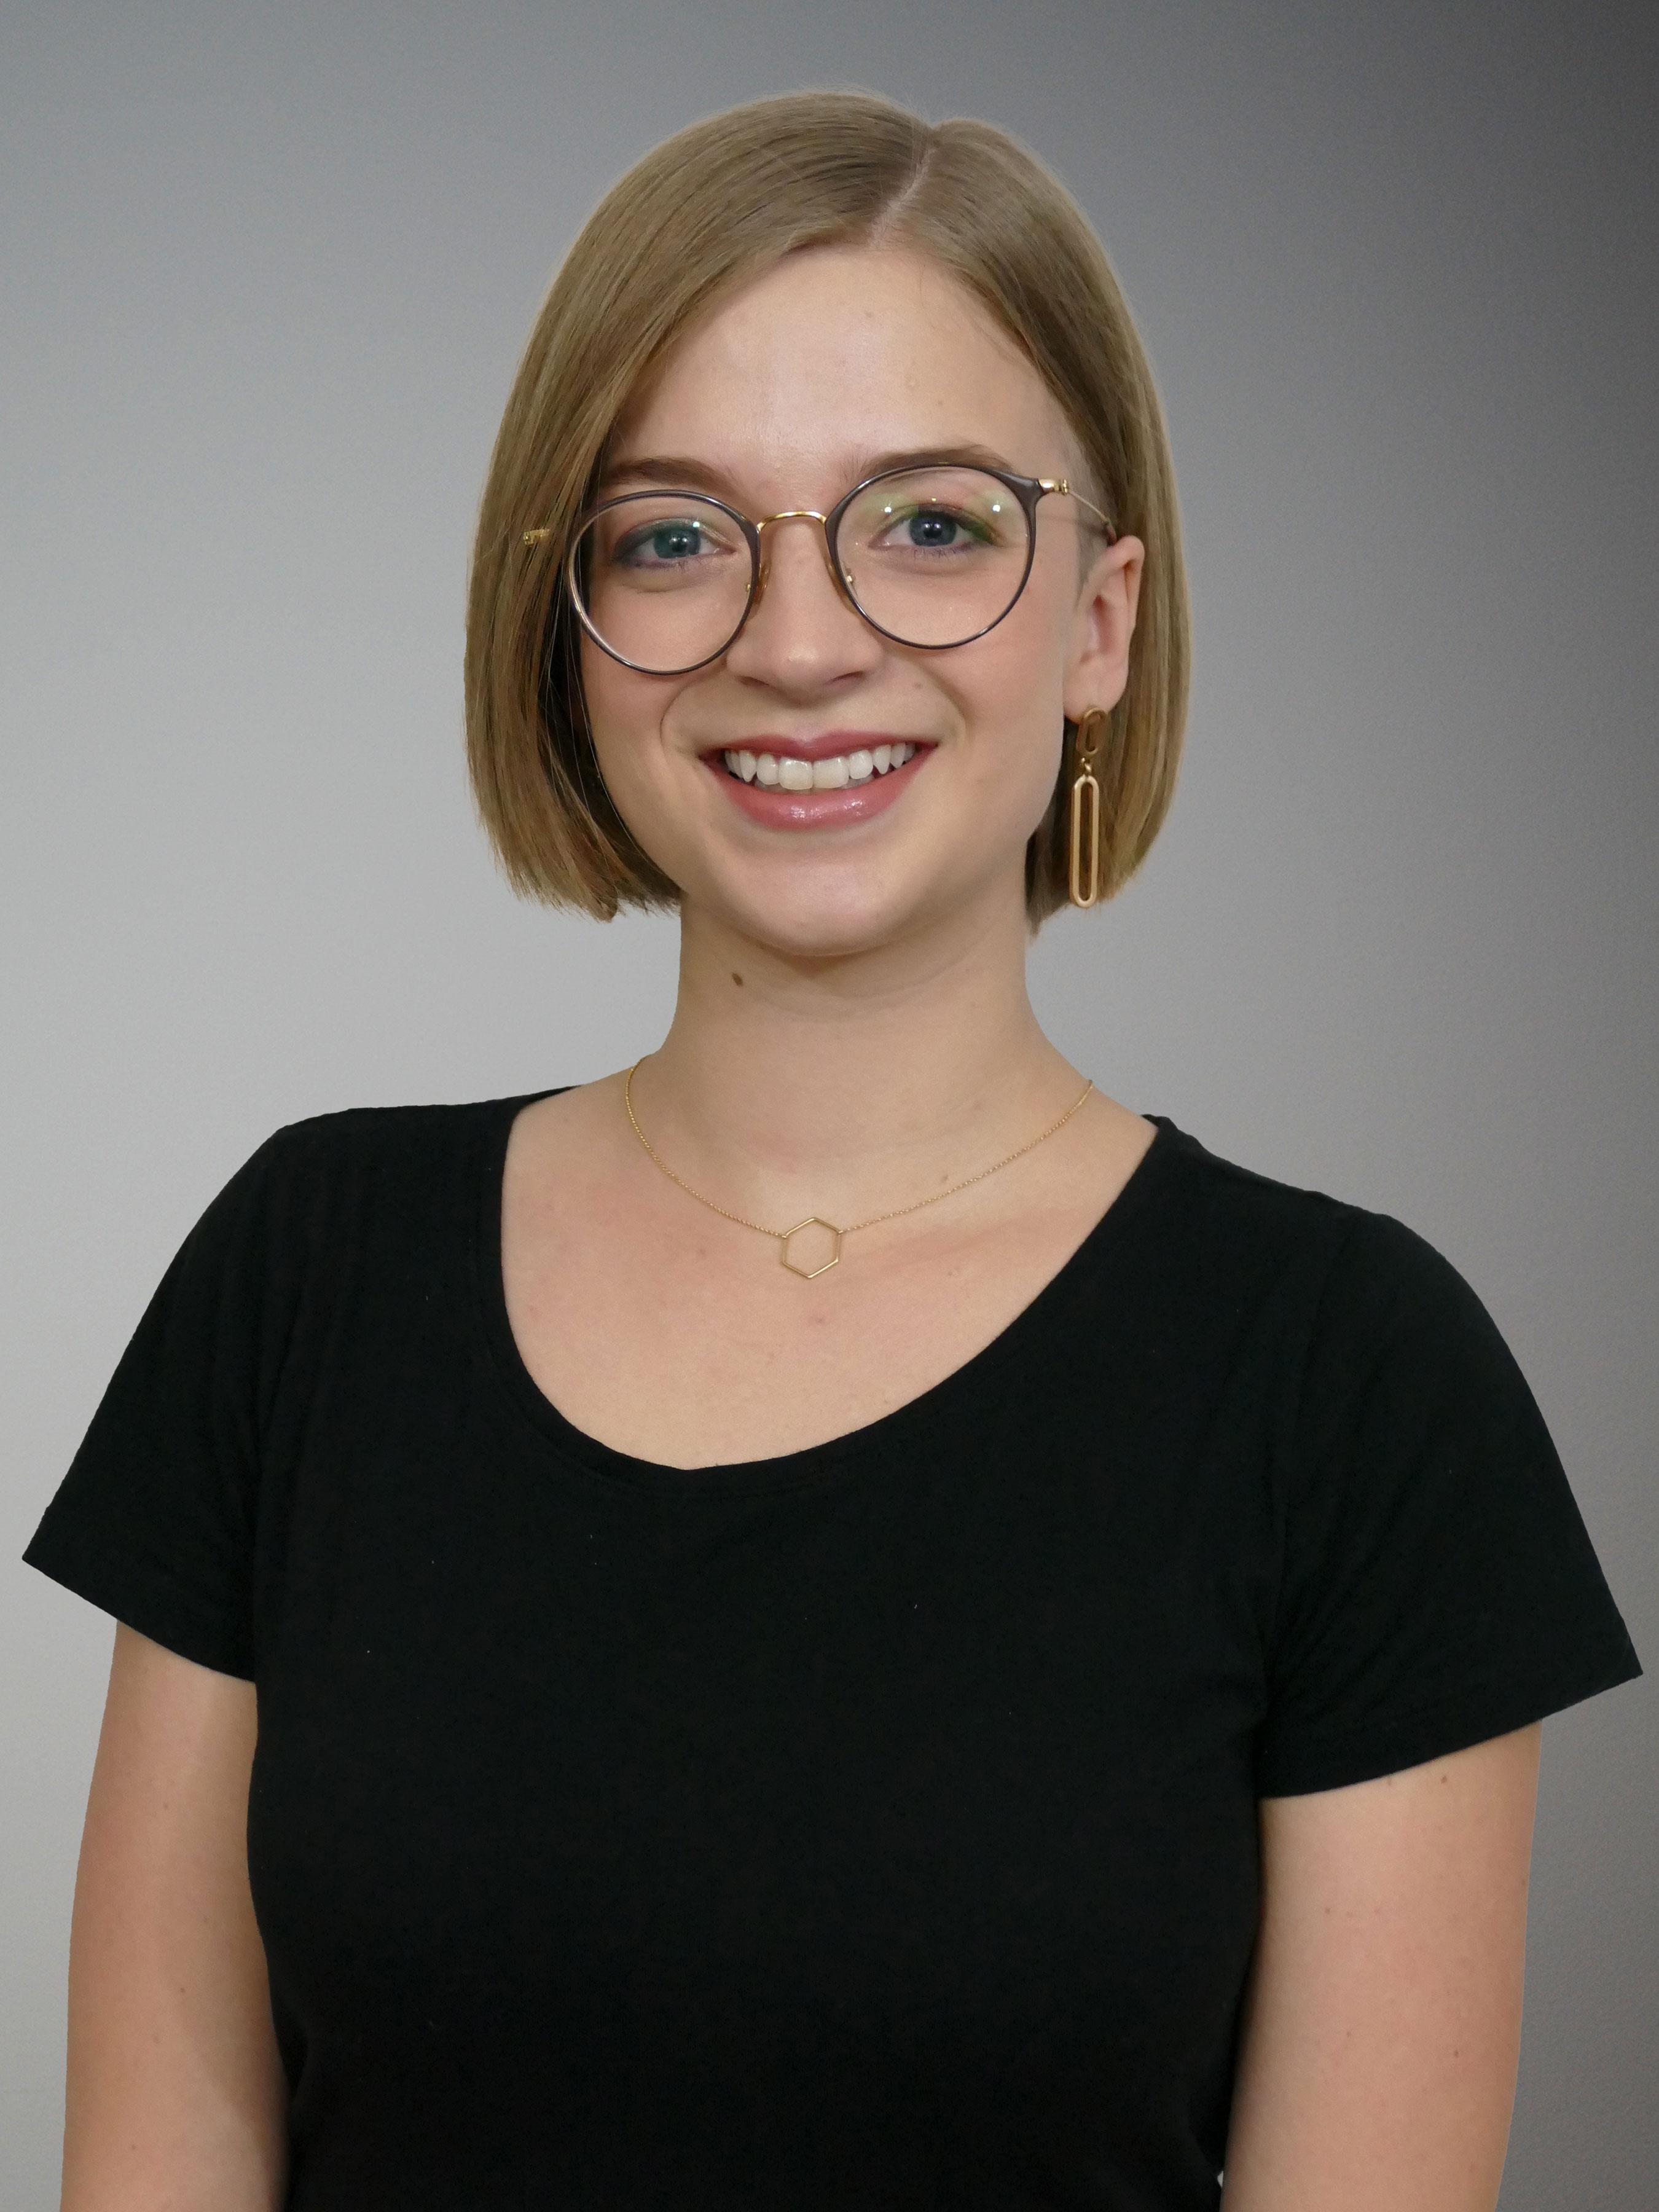 Sarah Dosier